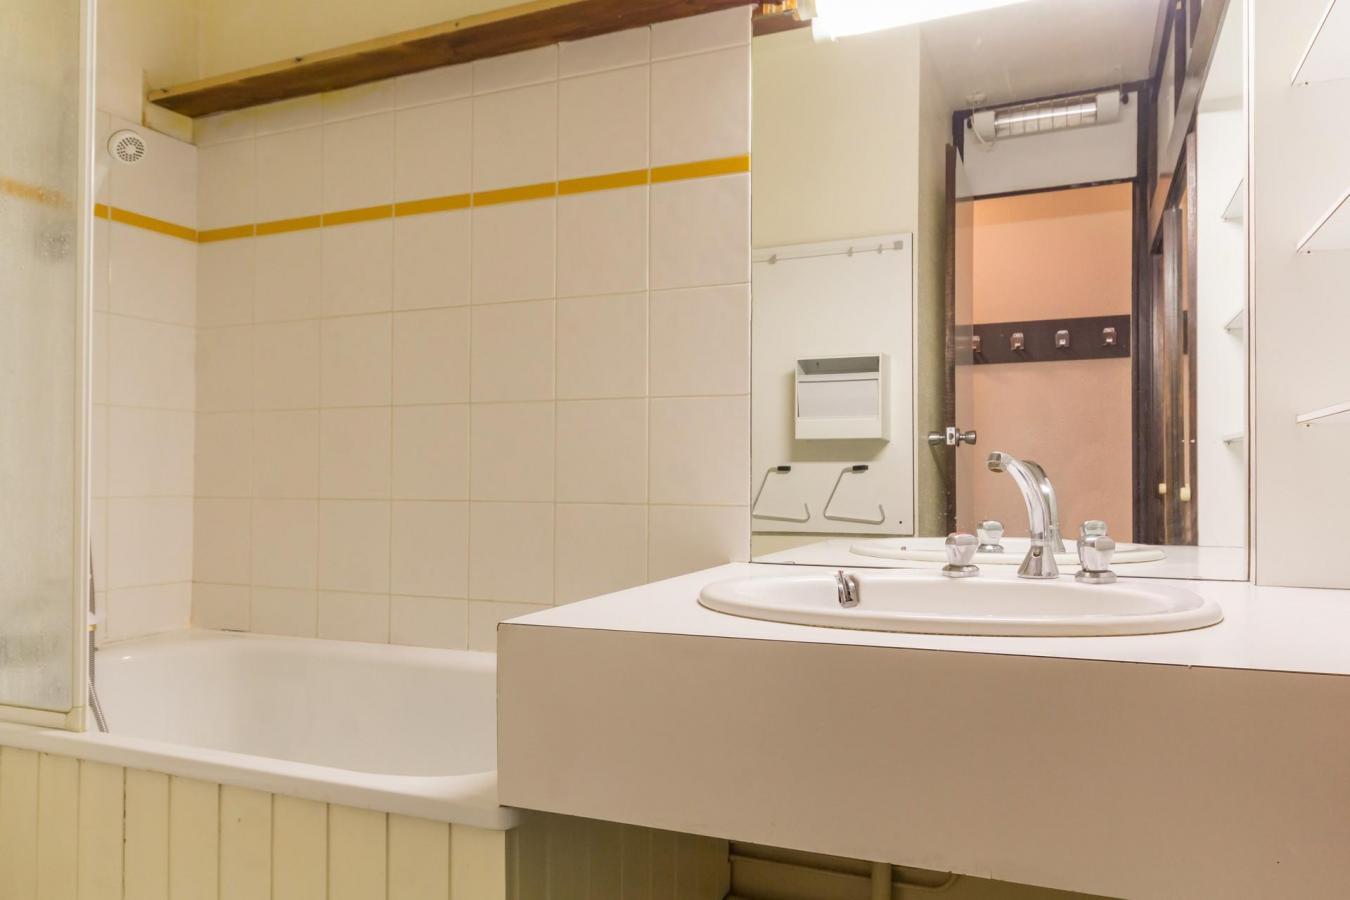 Location au ski Studio cabine 4 personnes (A2049) - Residence Aime 2000 - Le Diamant - La Plagne - Kitchenette